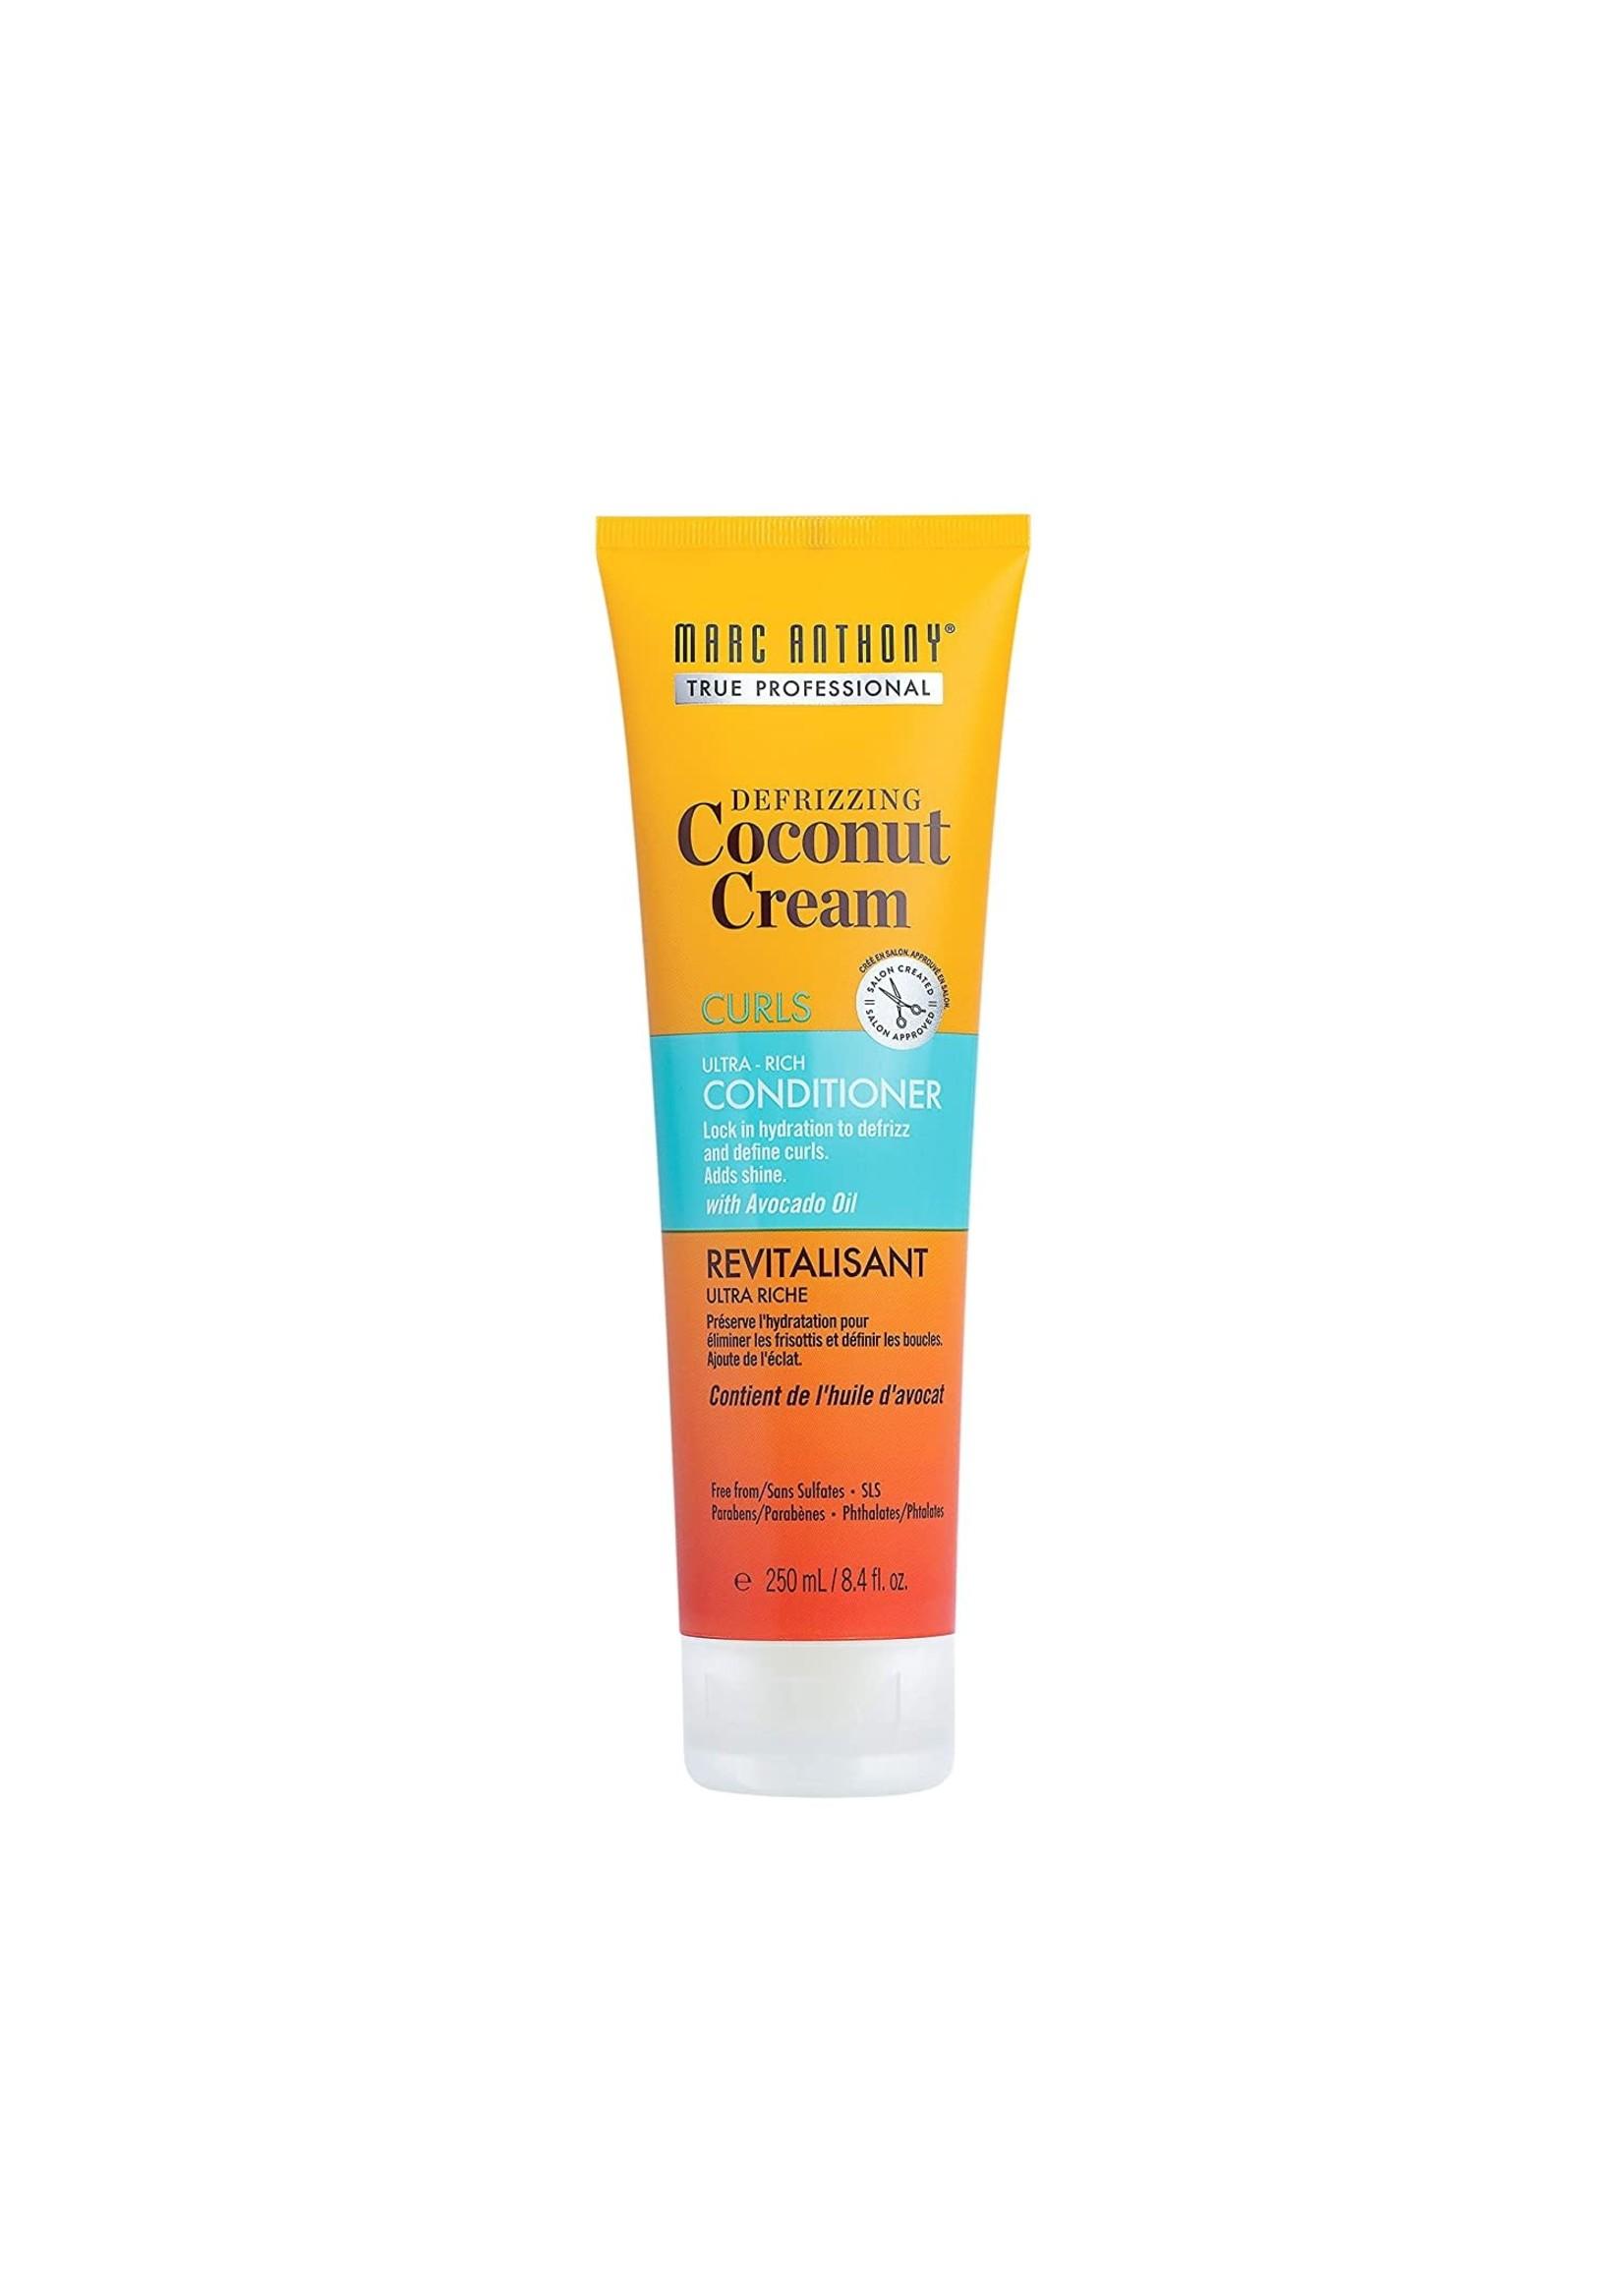 Marc Anthony Defrizzing Coconut Cream Conditioner